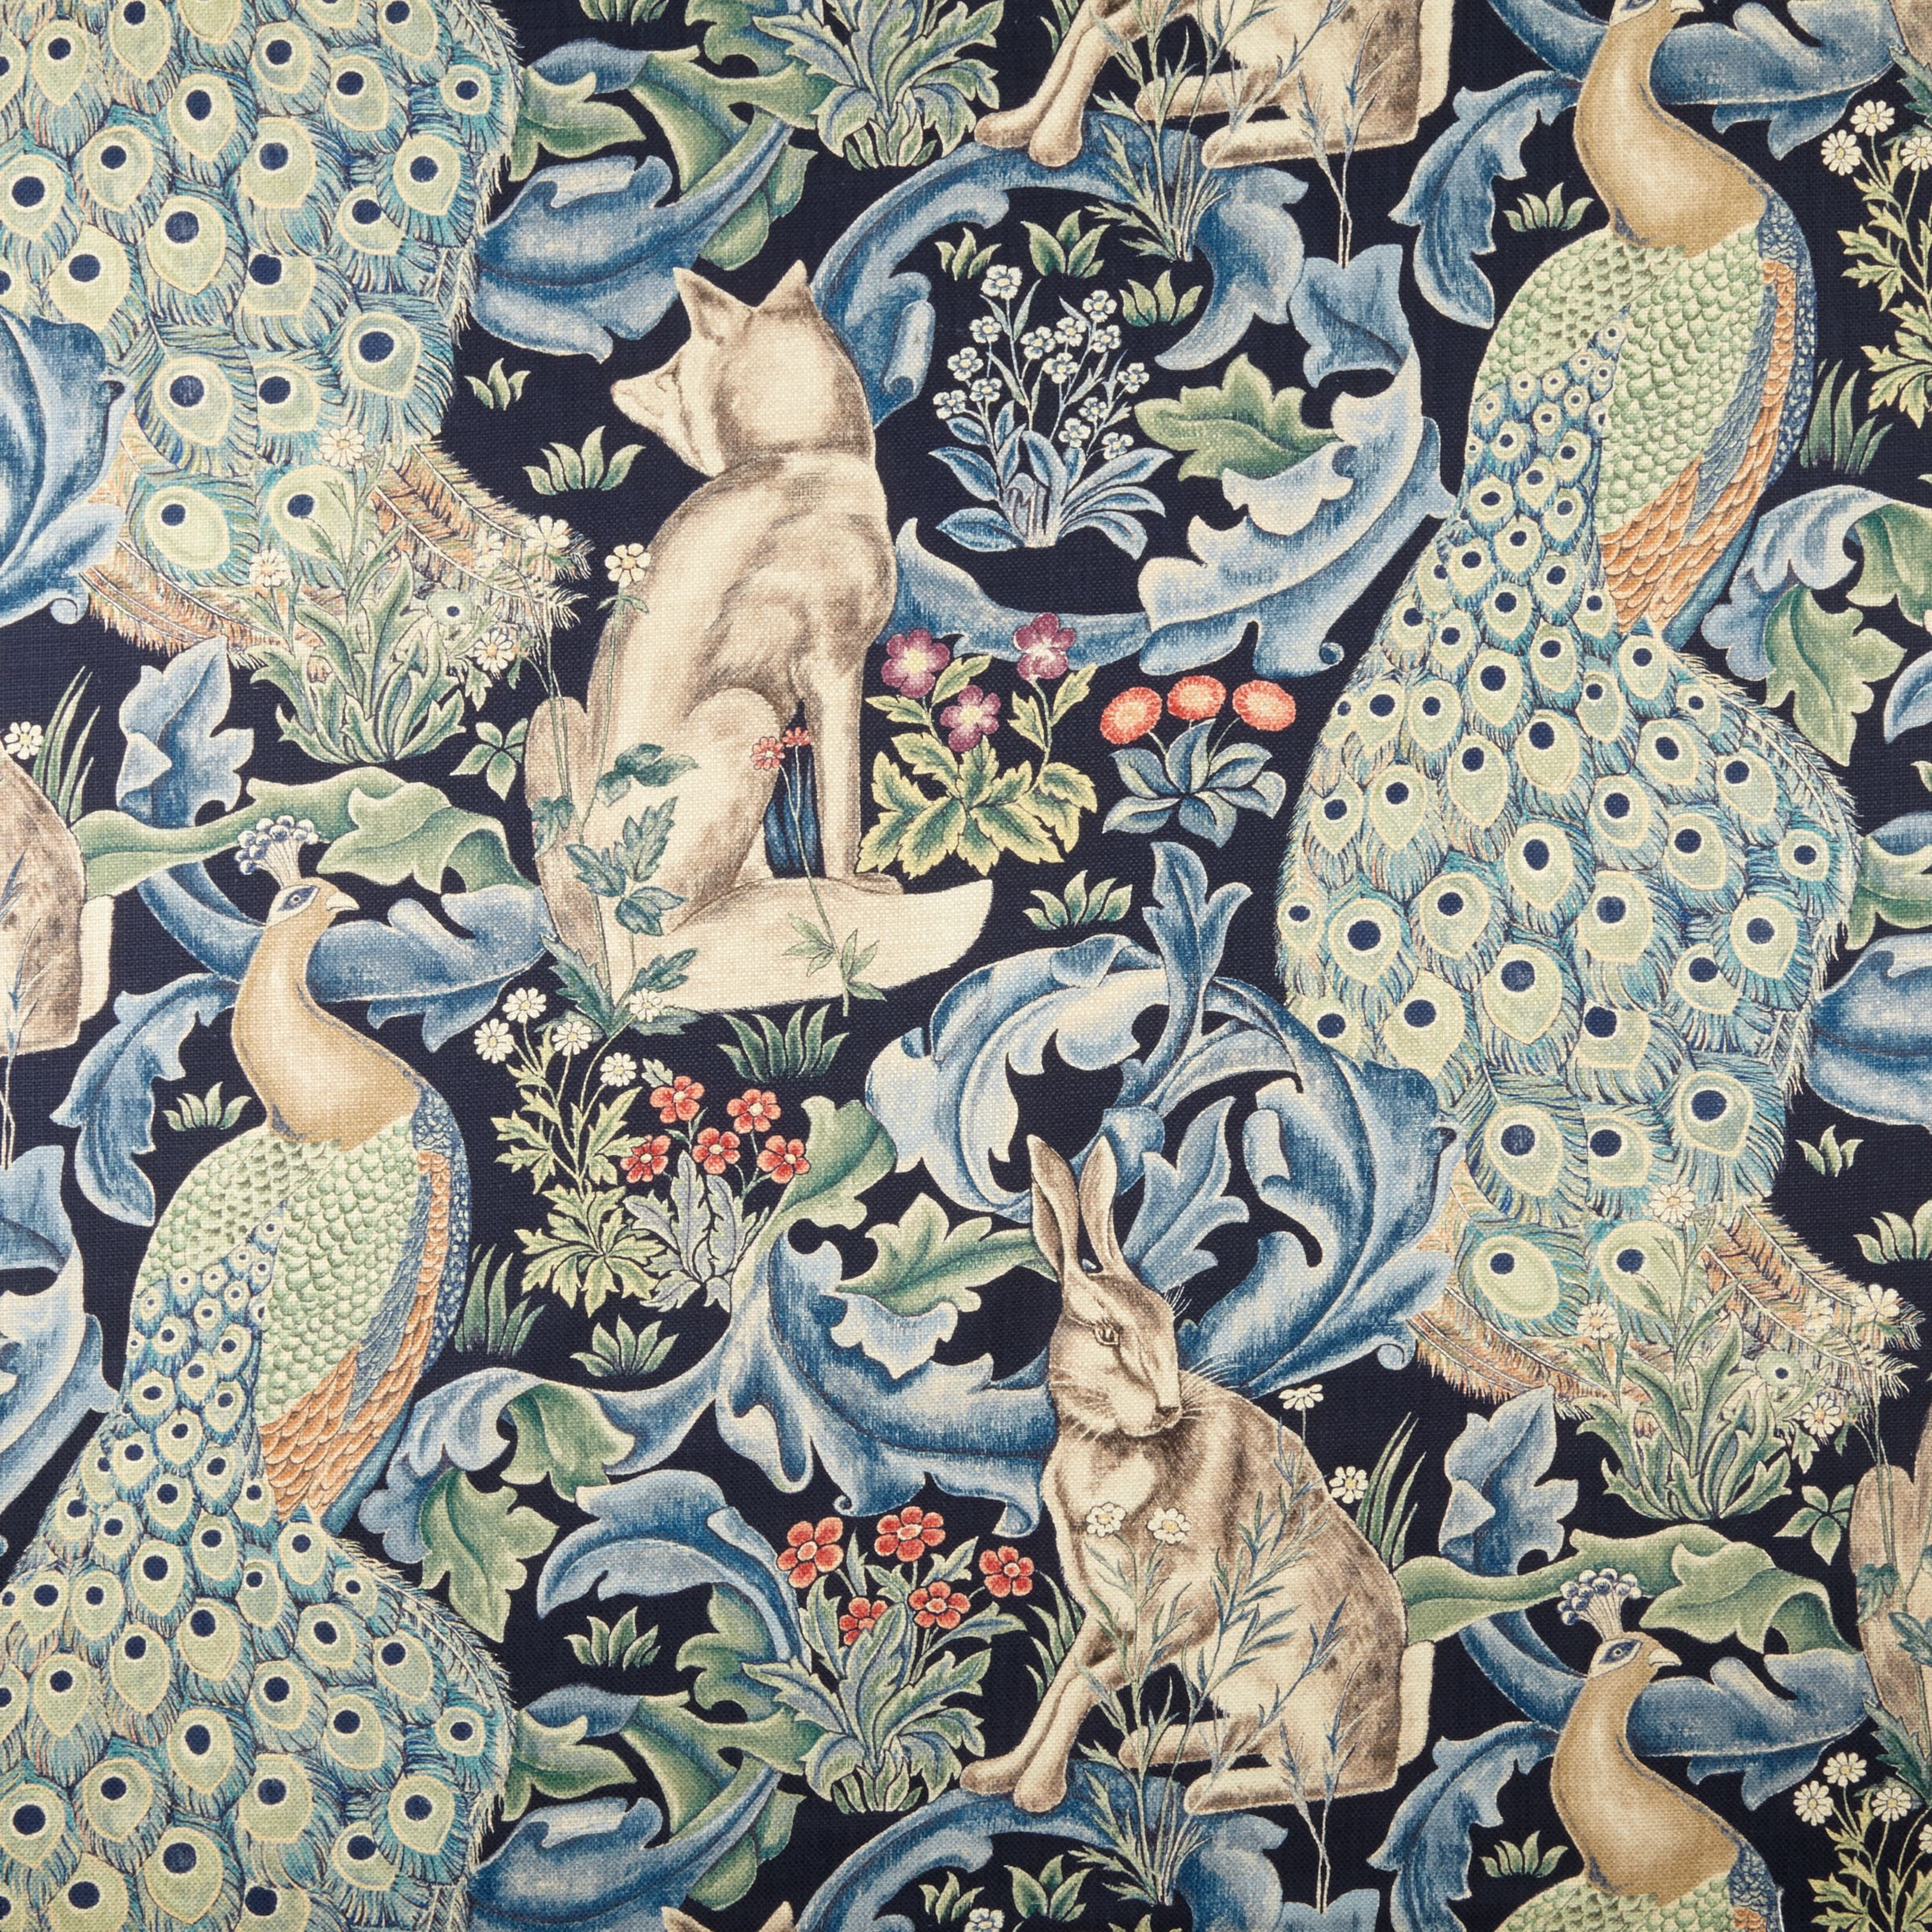 Morris & Co Morris & Co Forest Furnishing Fabric, Indigo